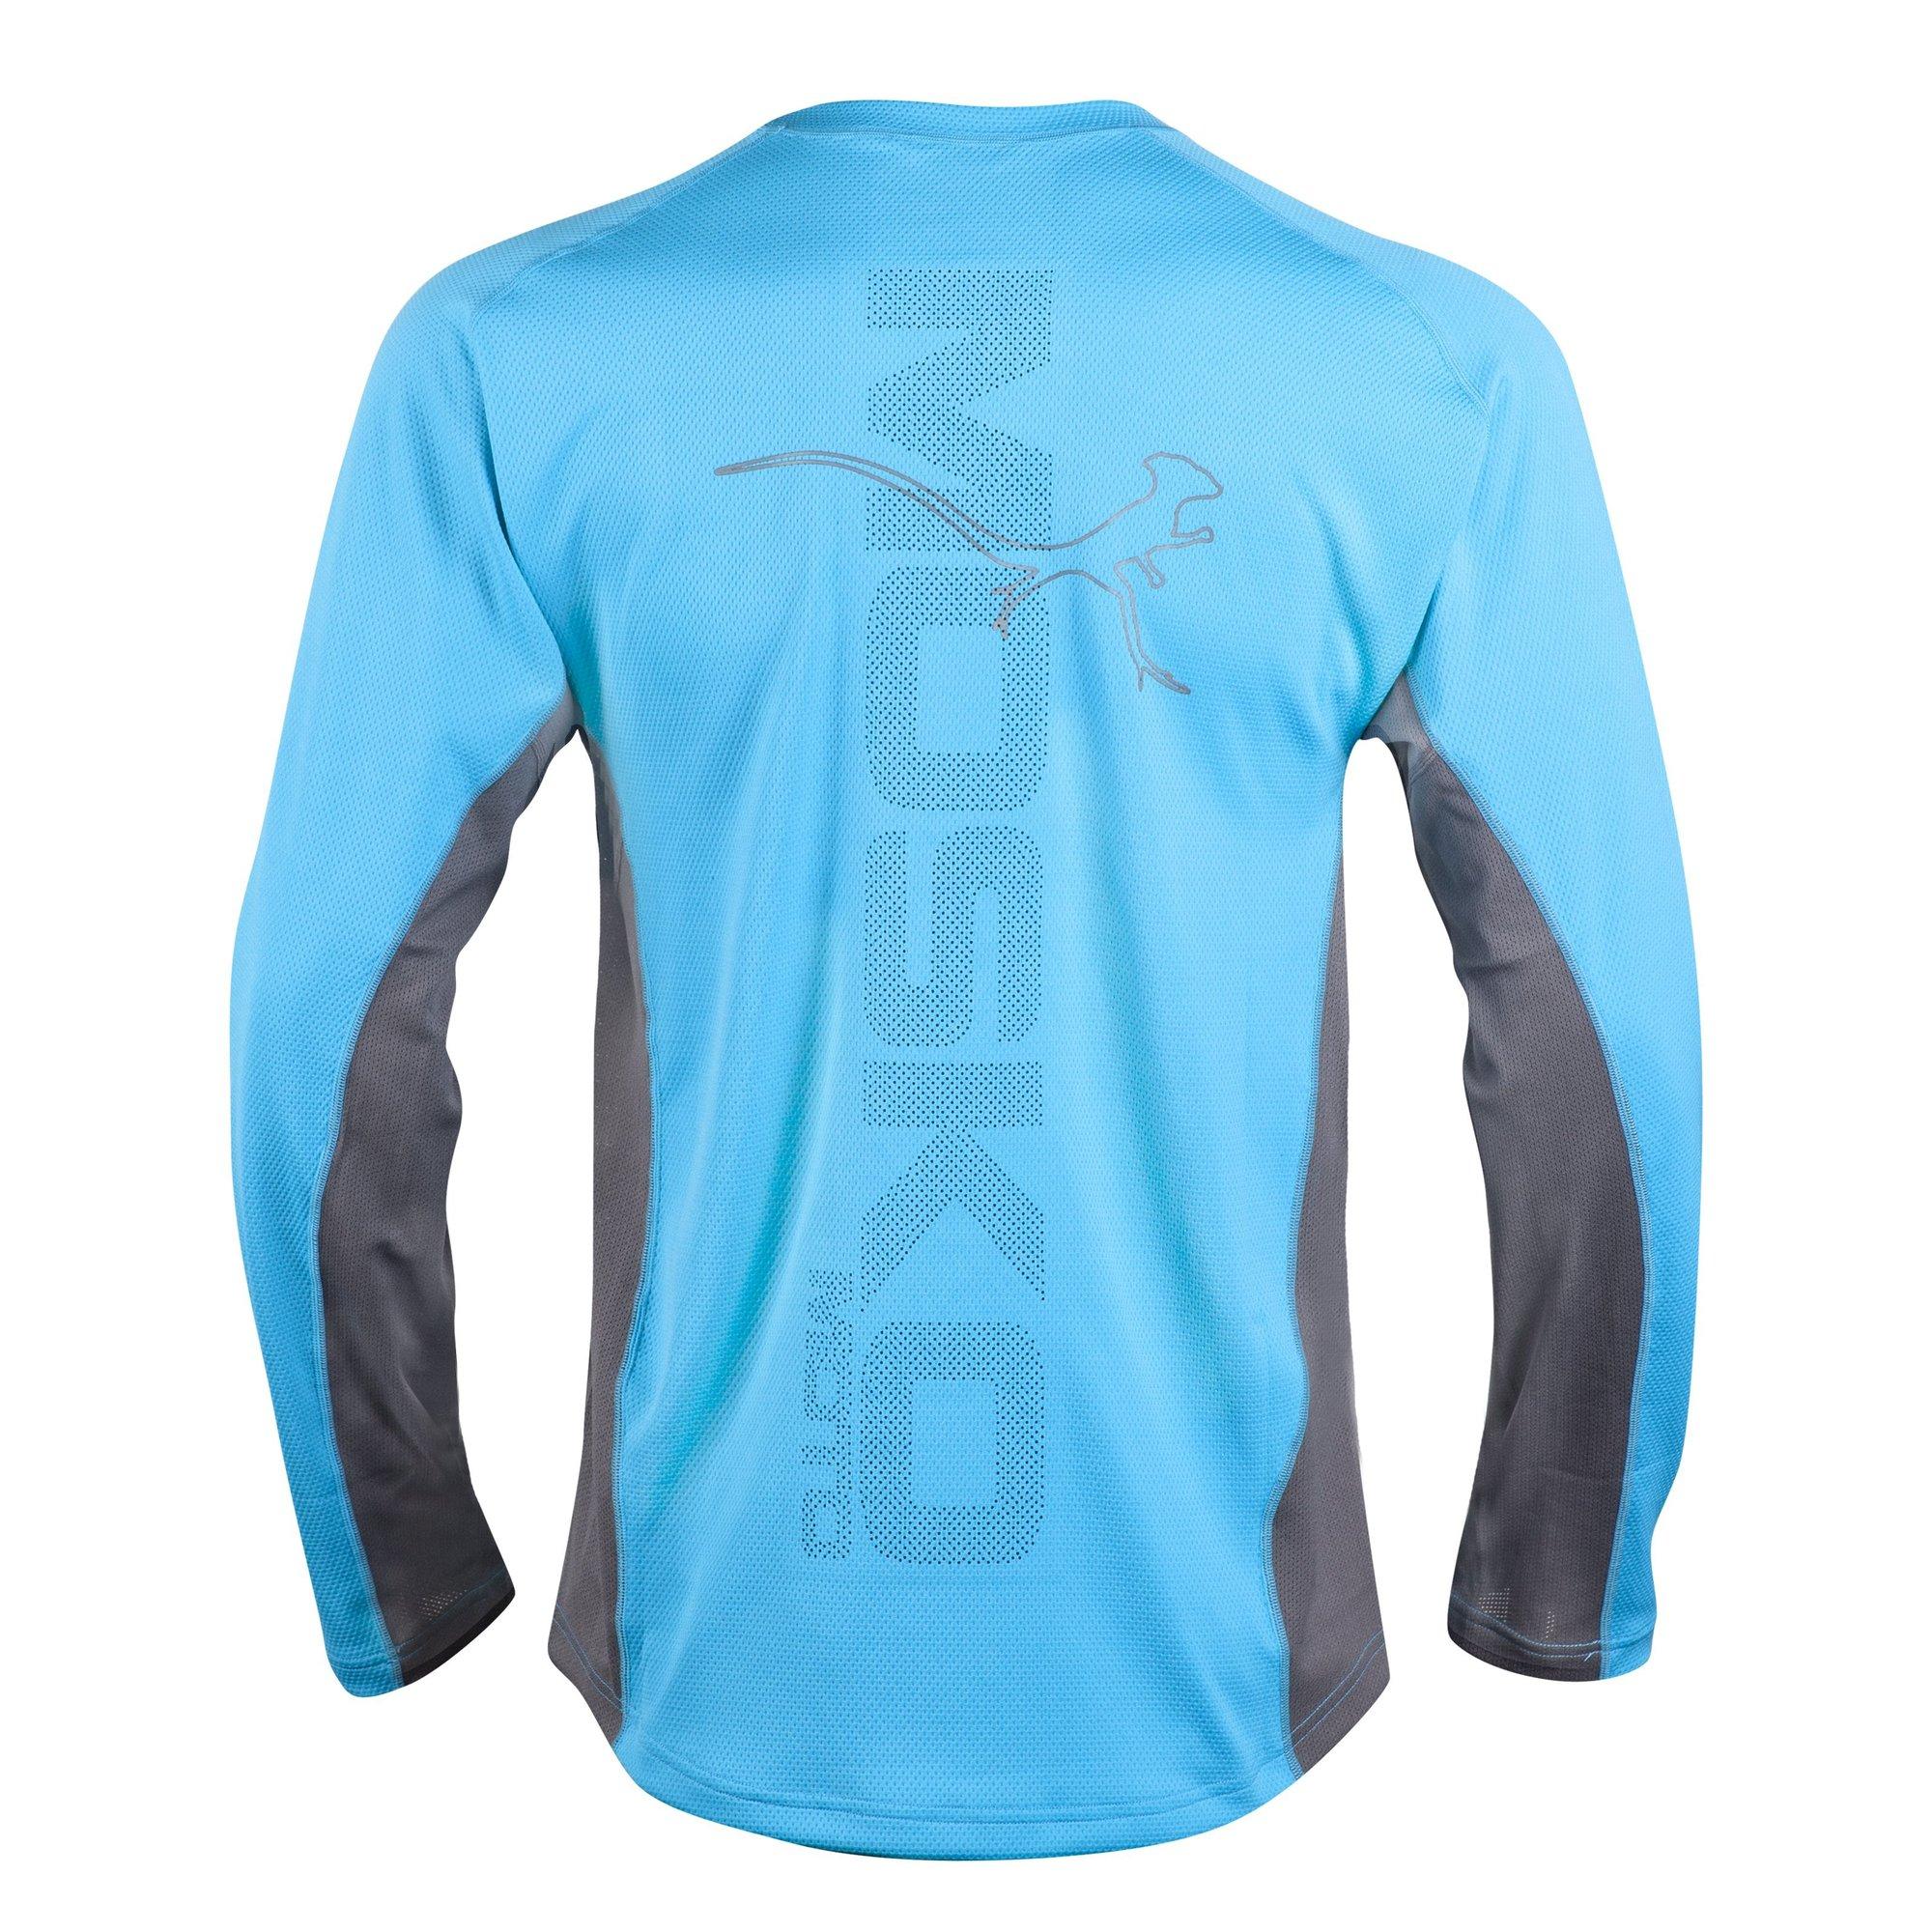 mosko-moto-apparel-signal-jersey-11333239701565_2000x.jpg